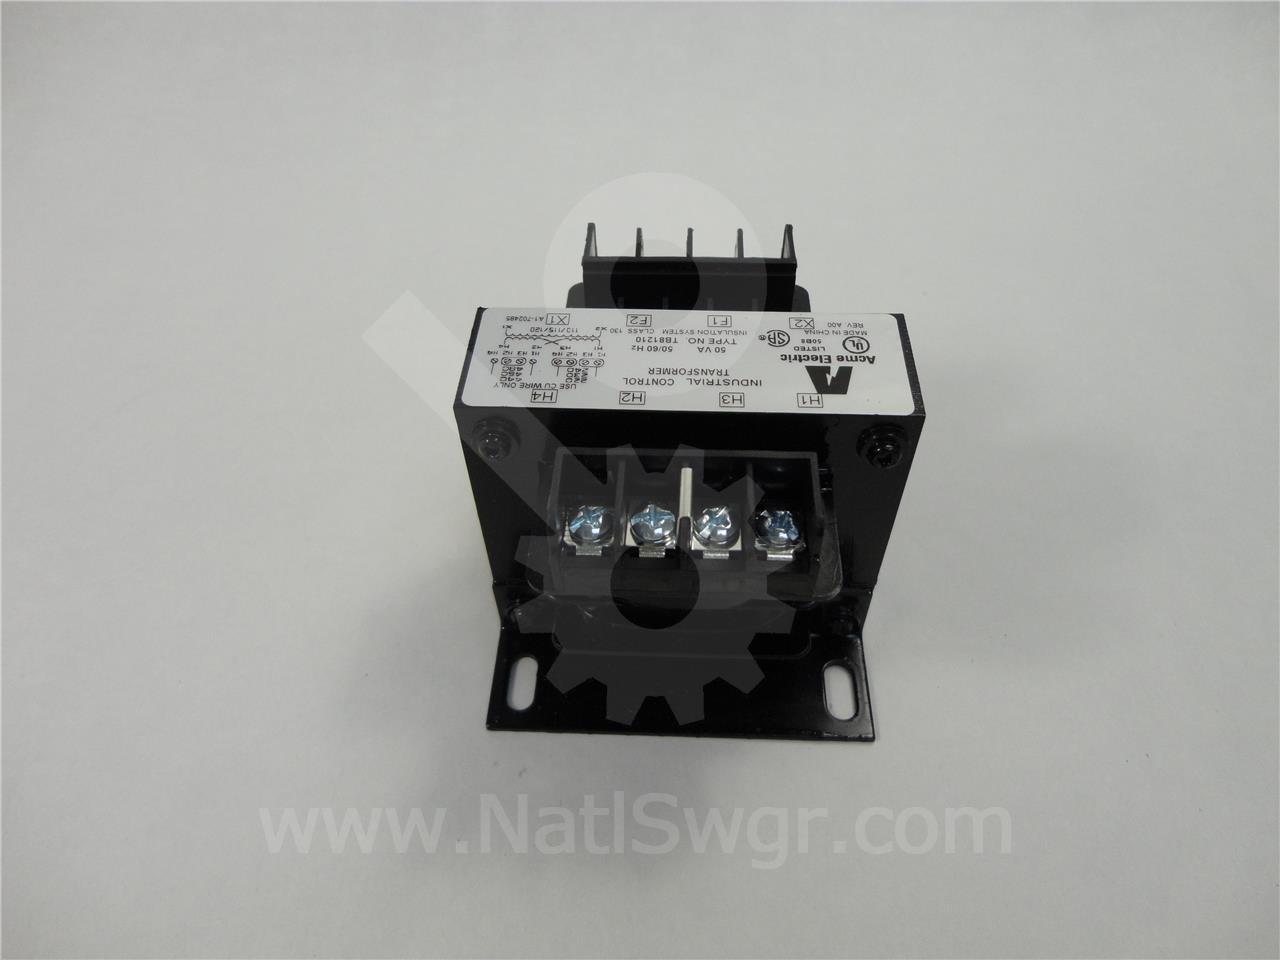 TB81210 ACME 4:1 CONTROL POWER TRANSFORMER, 50VA 480:120